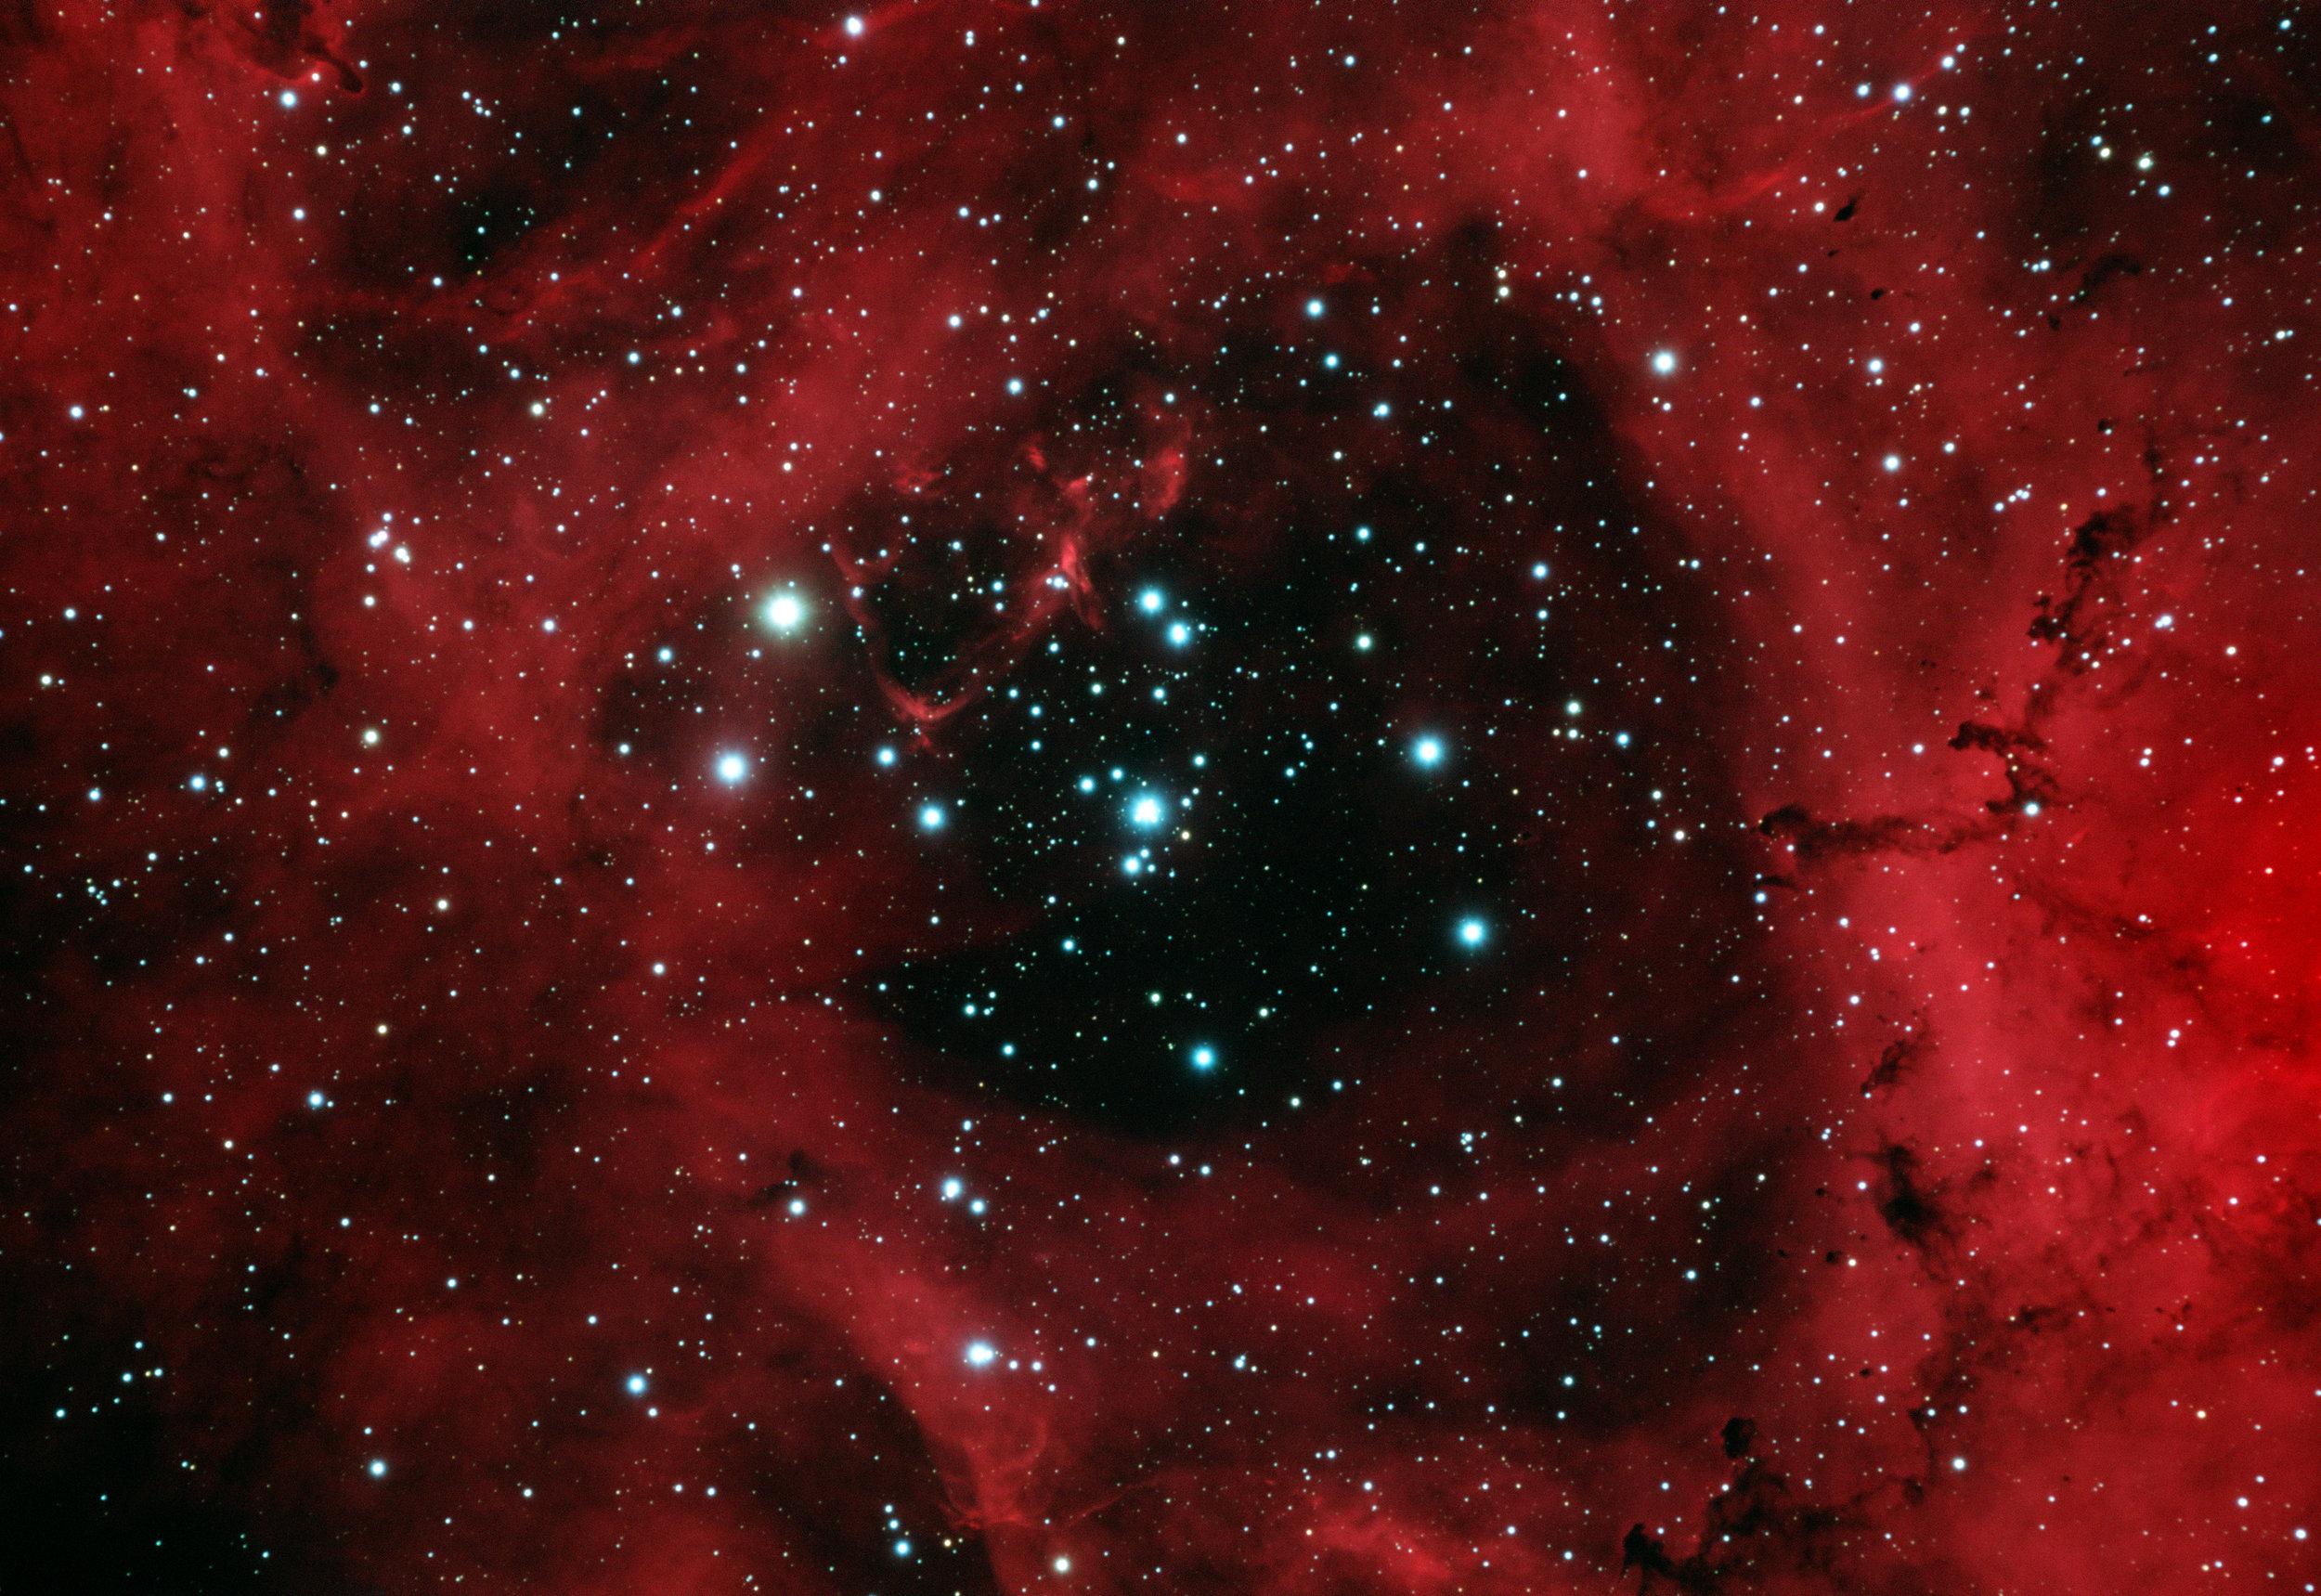 Rosette Nebula ZWO1000 20190130 RGB 03 4000.jpg